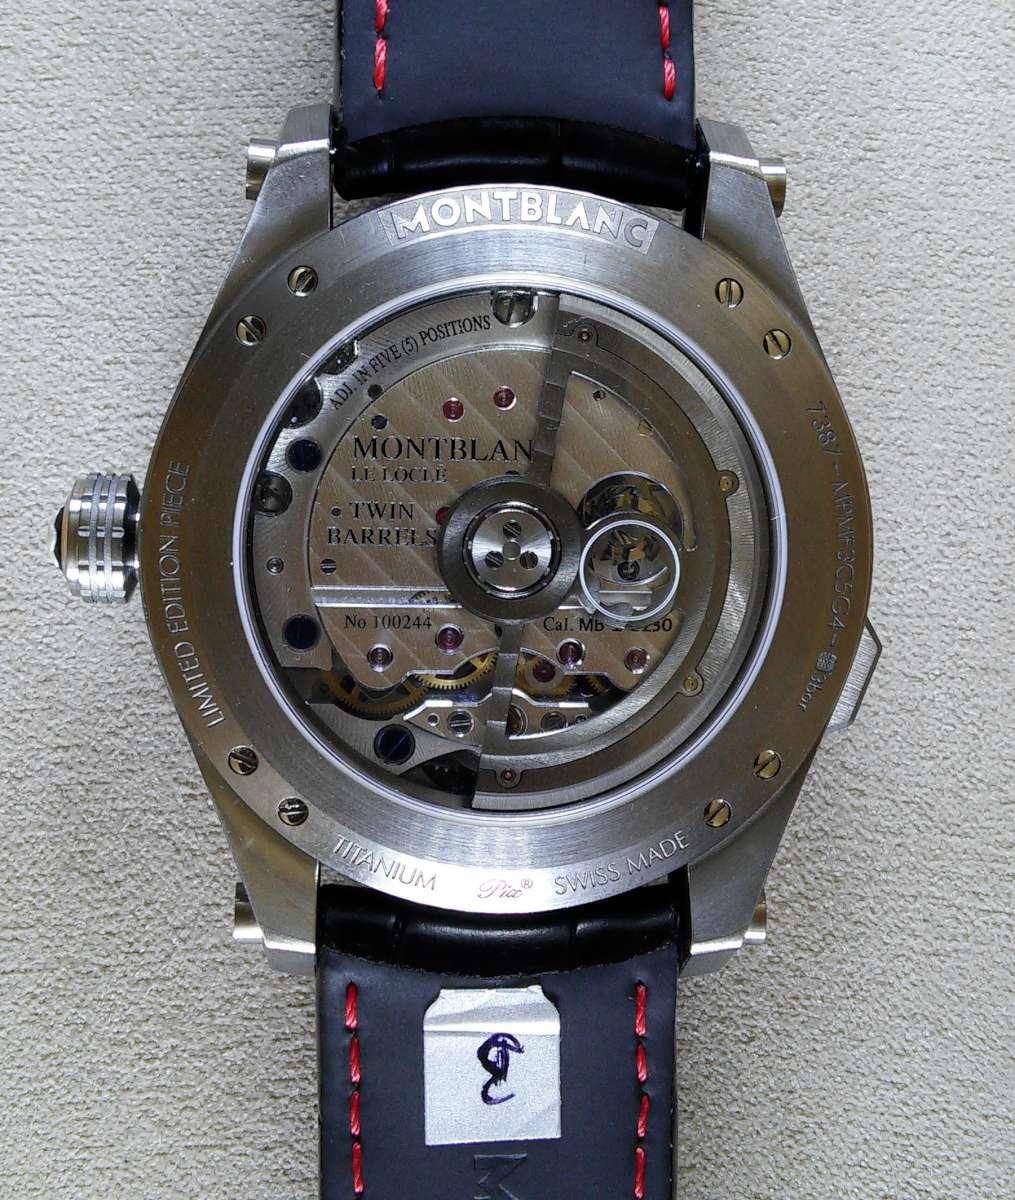 Montblanc TimeWalker ExoTourbillon Minute Chronograph caseback